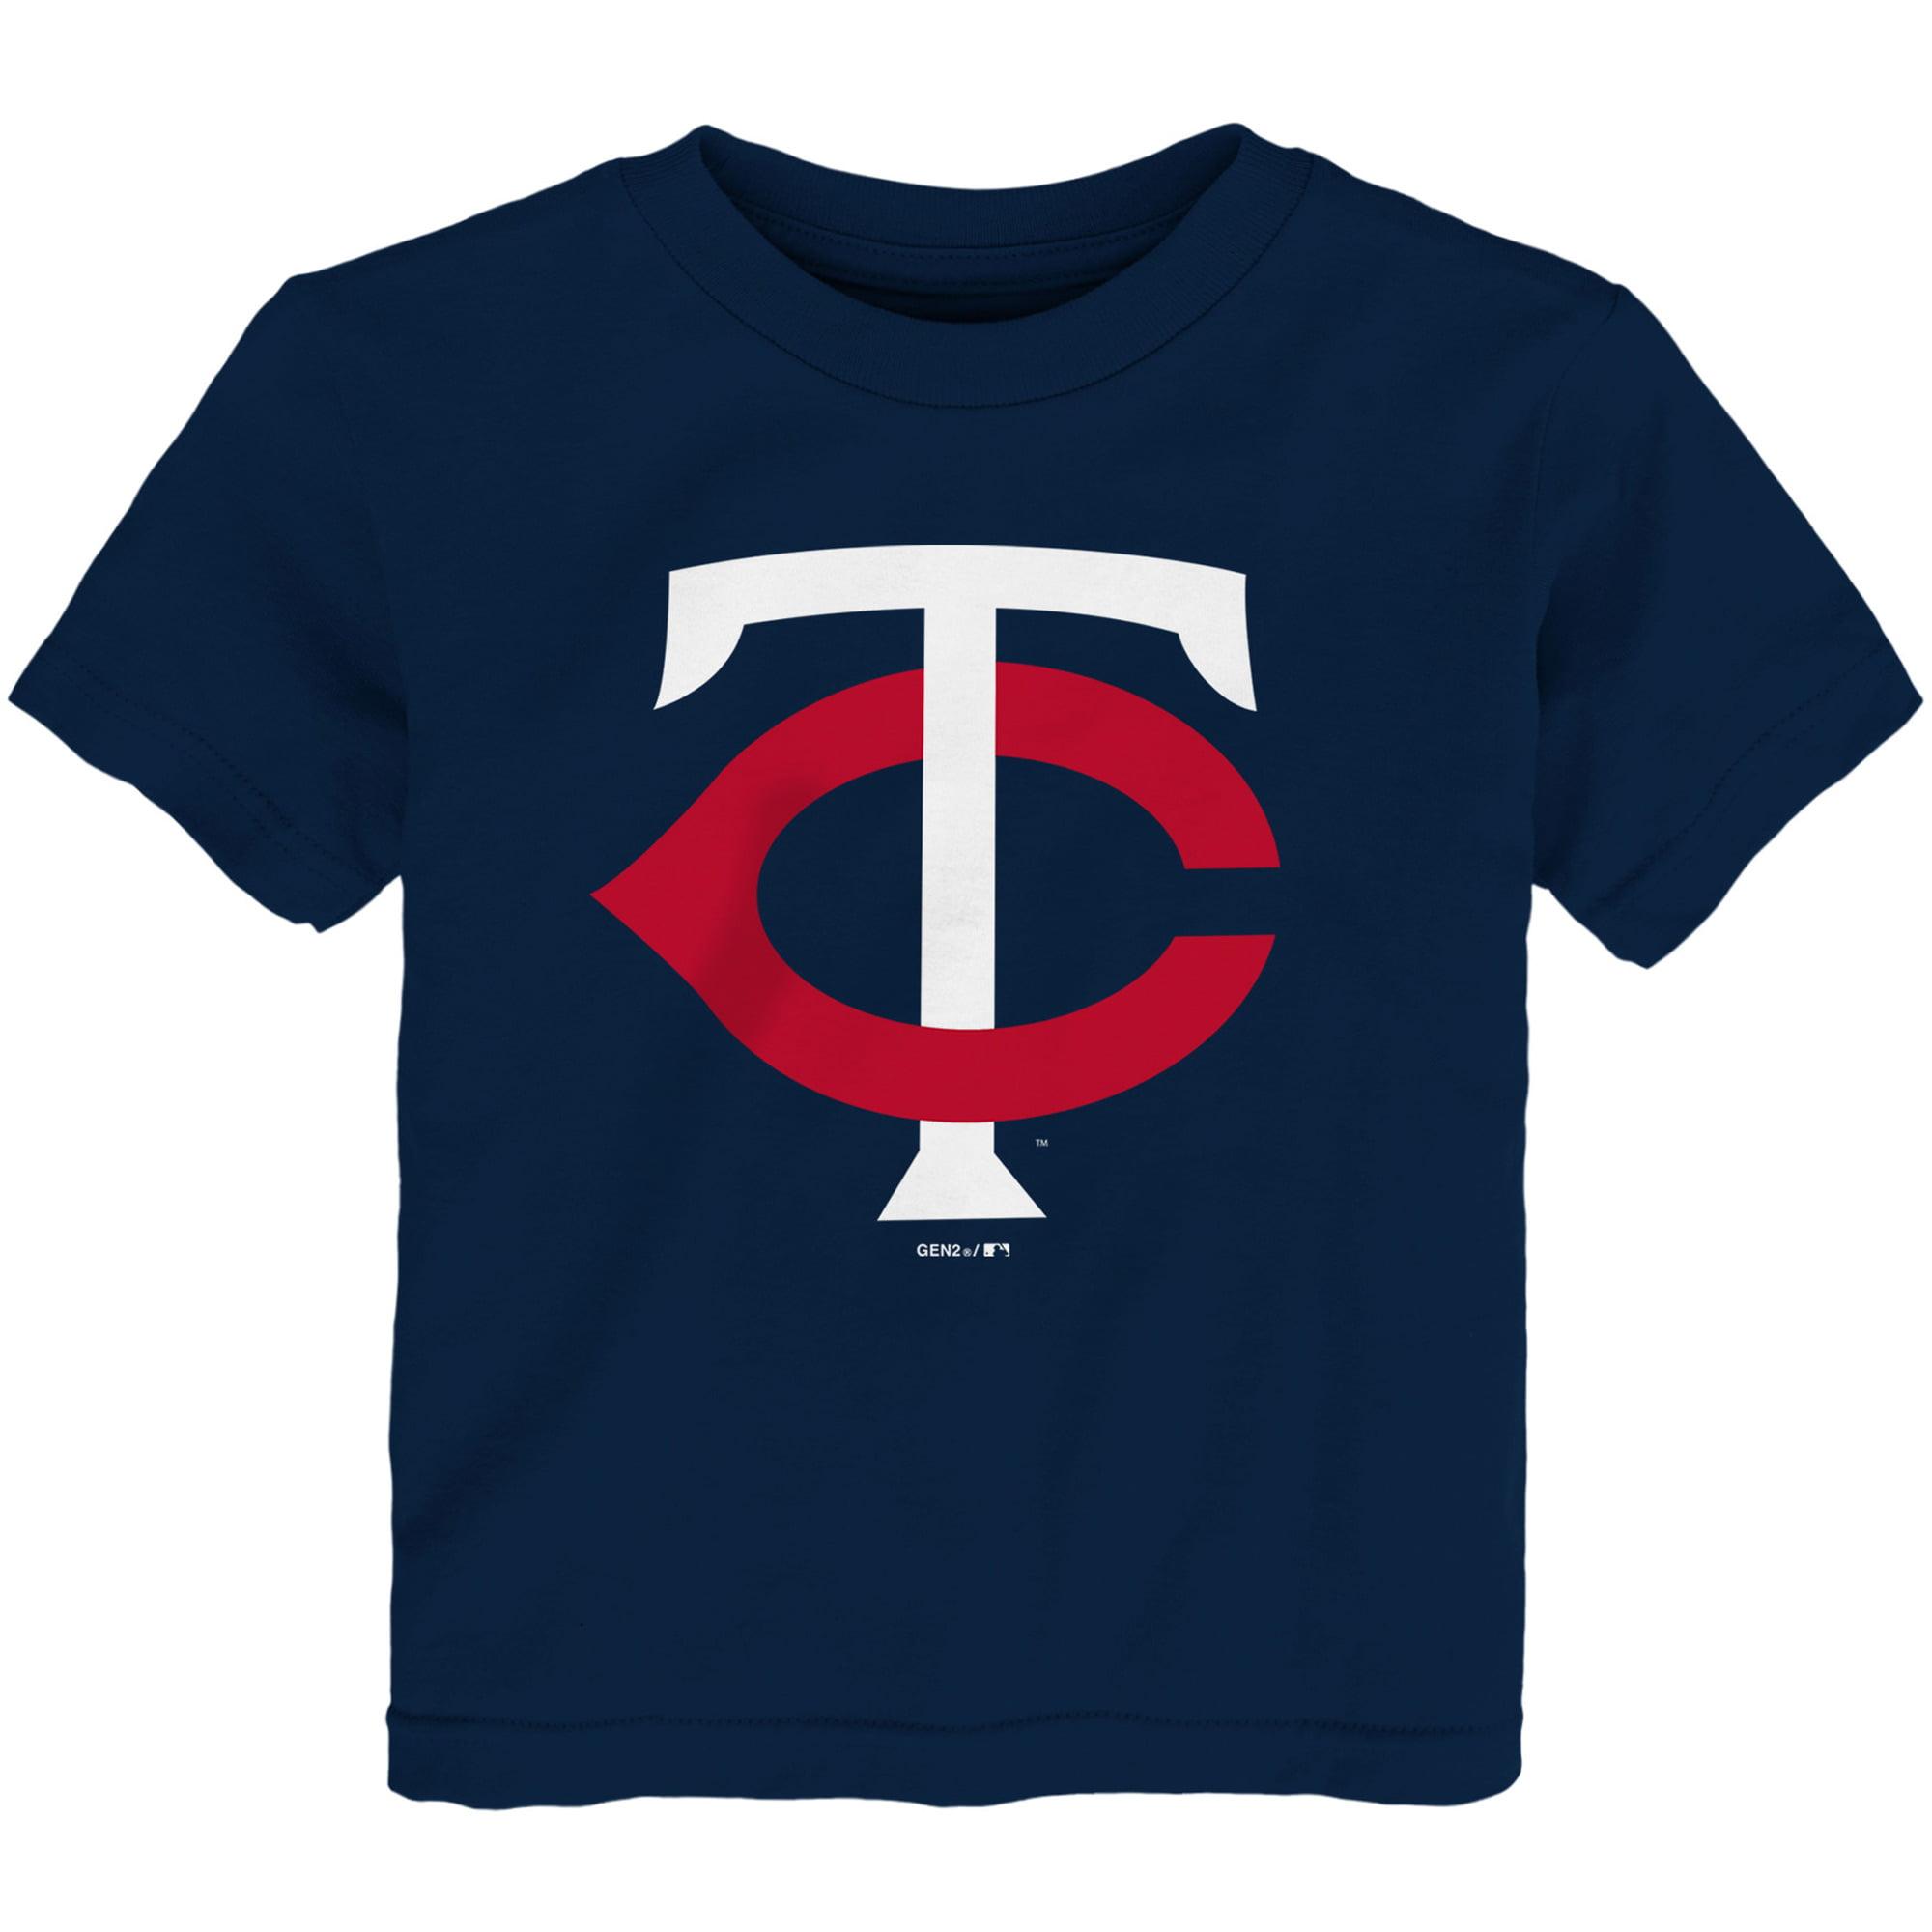 Minnesota Twins Toddler Team Primary Logo T-Shirt - Navy